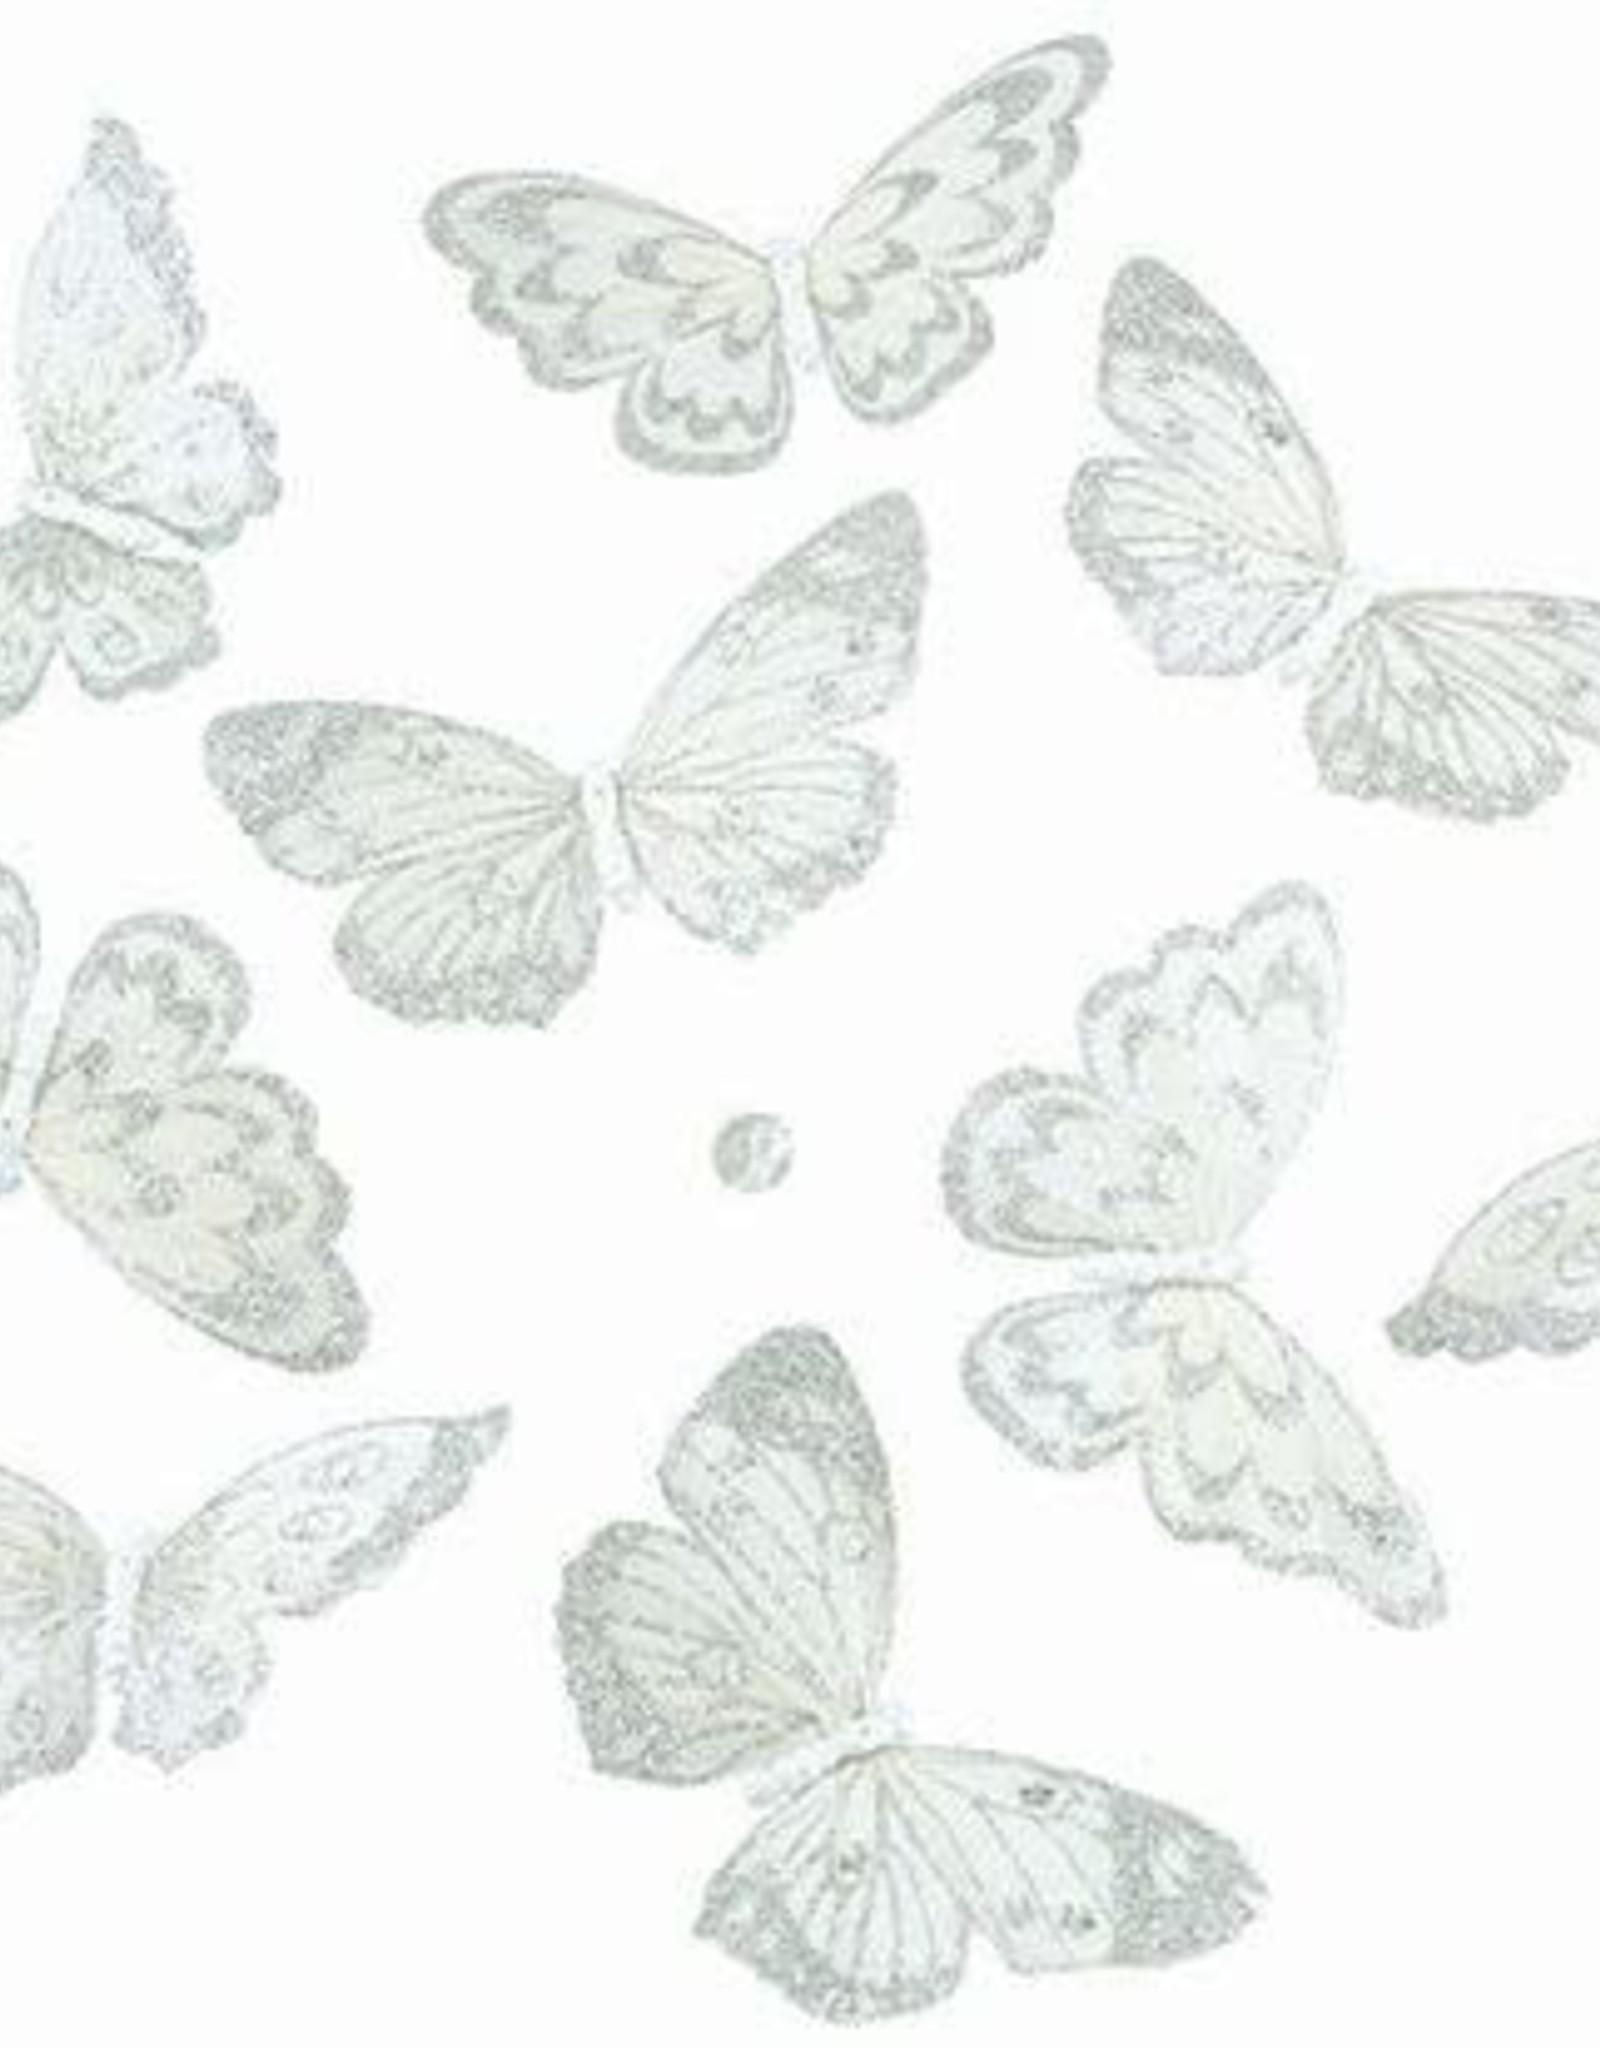 "Gifts of Nature THH1132 NAT'L WHITE W/SILVER GLTR BTRFLY GRLD 9PC 5x2.5x78""l"